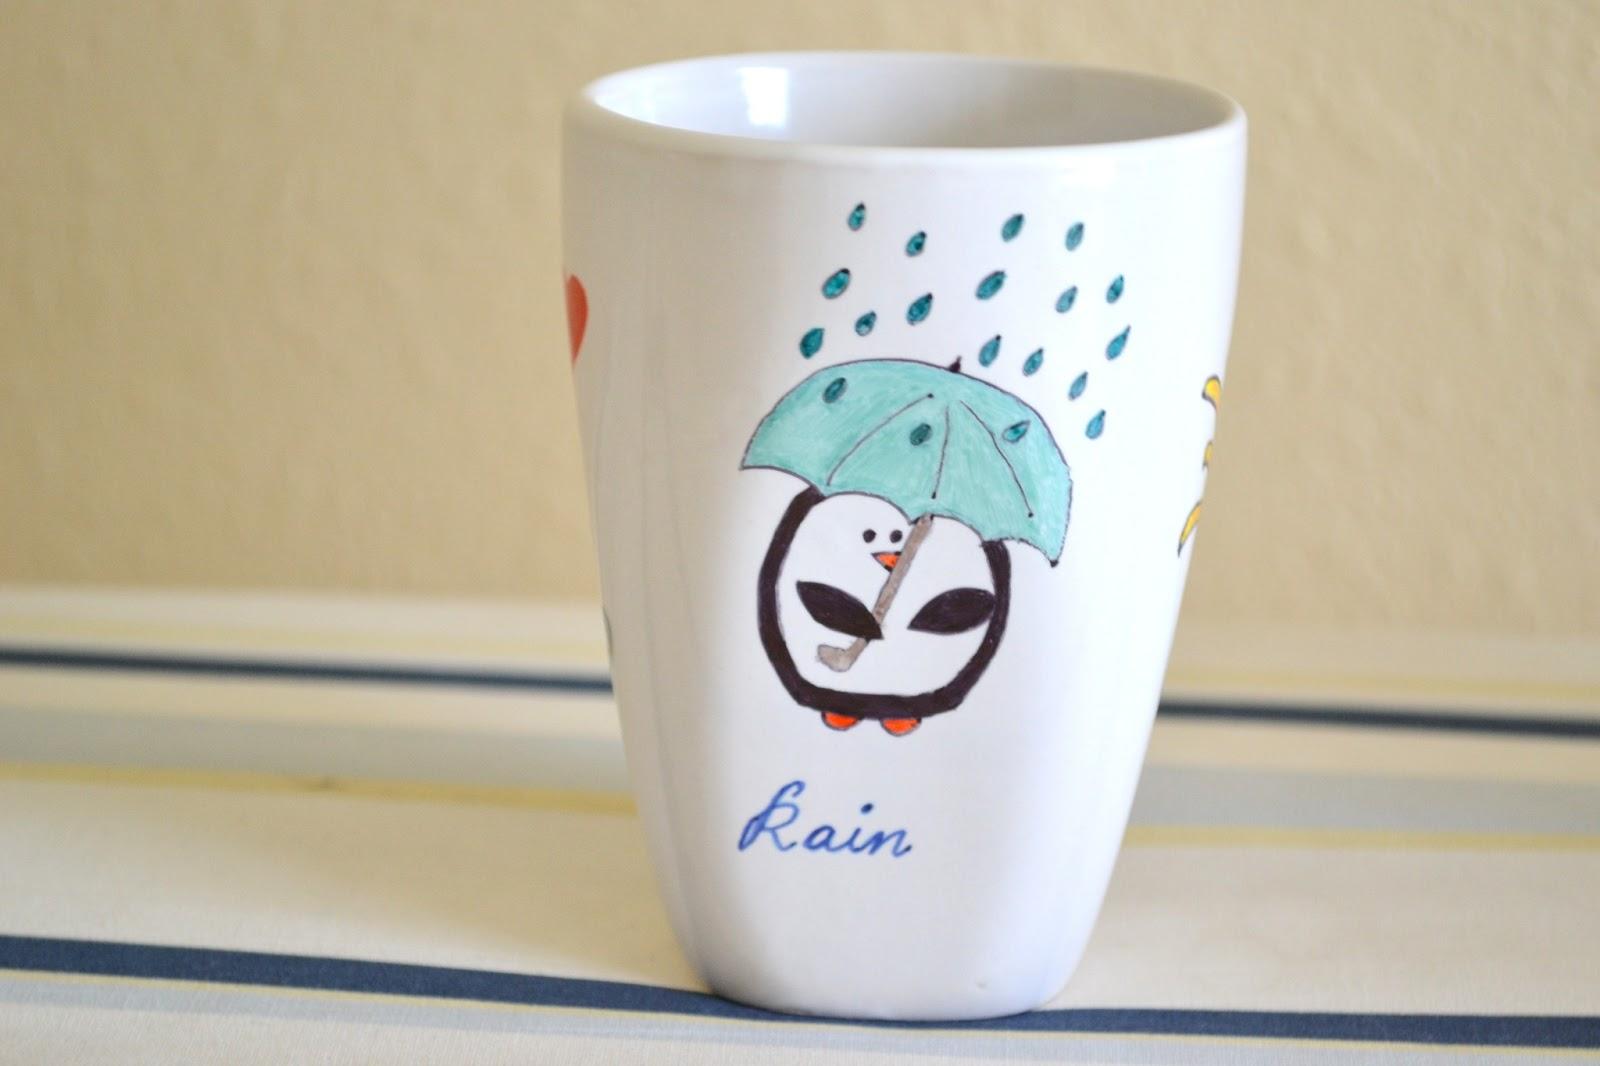 I Love Coffee Mug Gift Funny Painted Cup